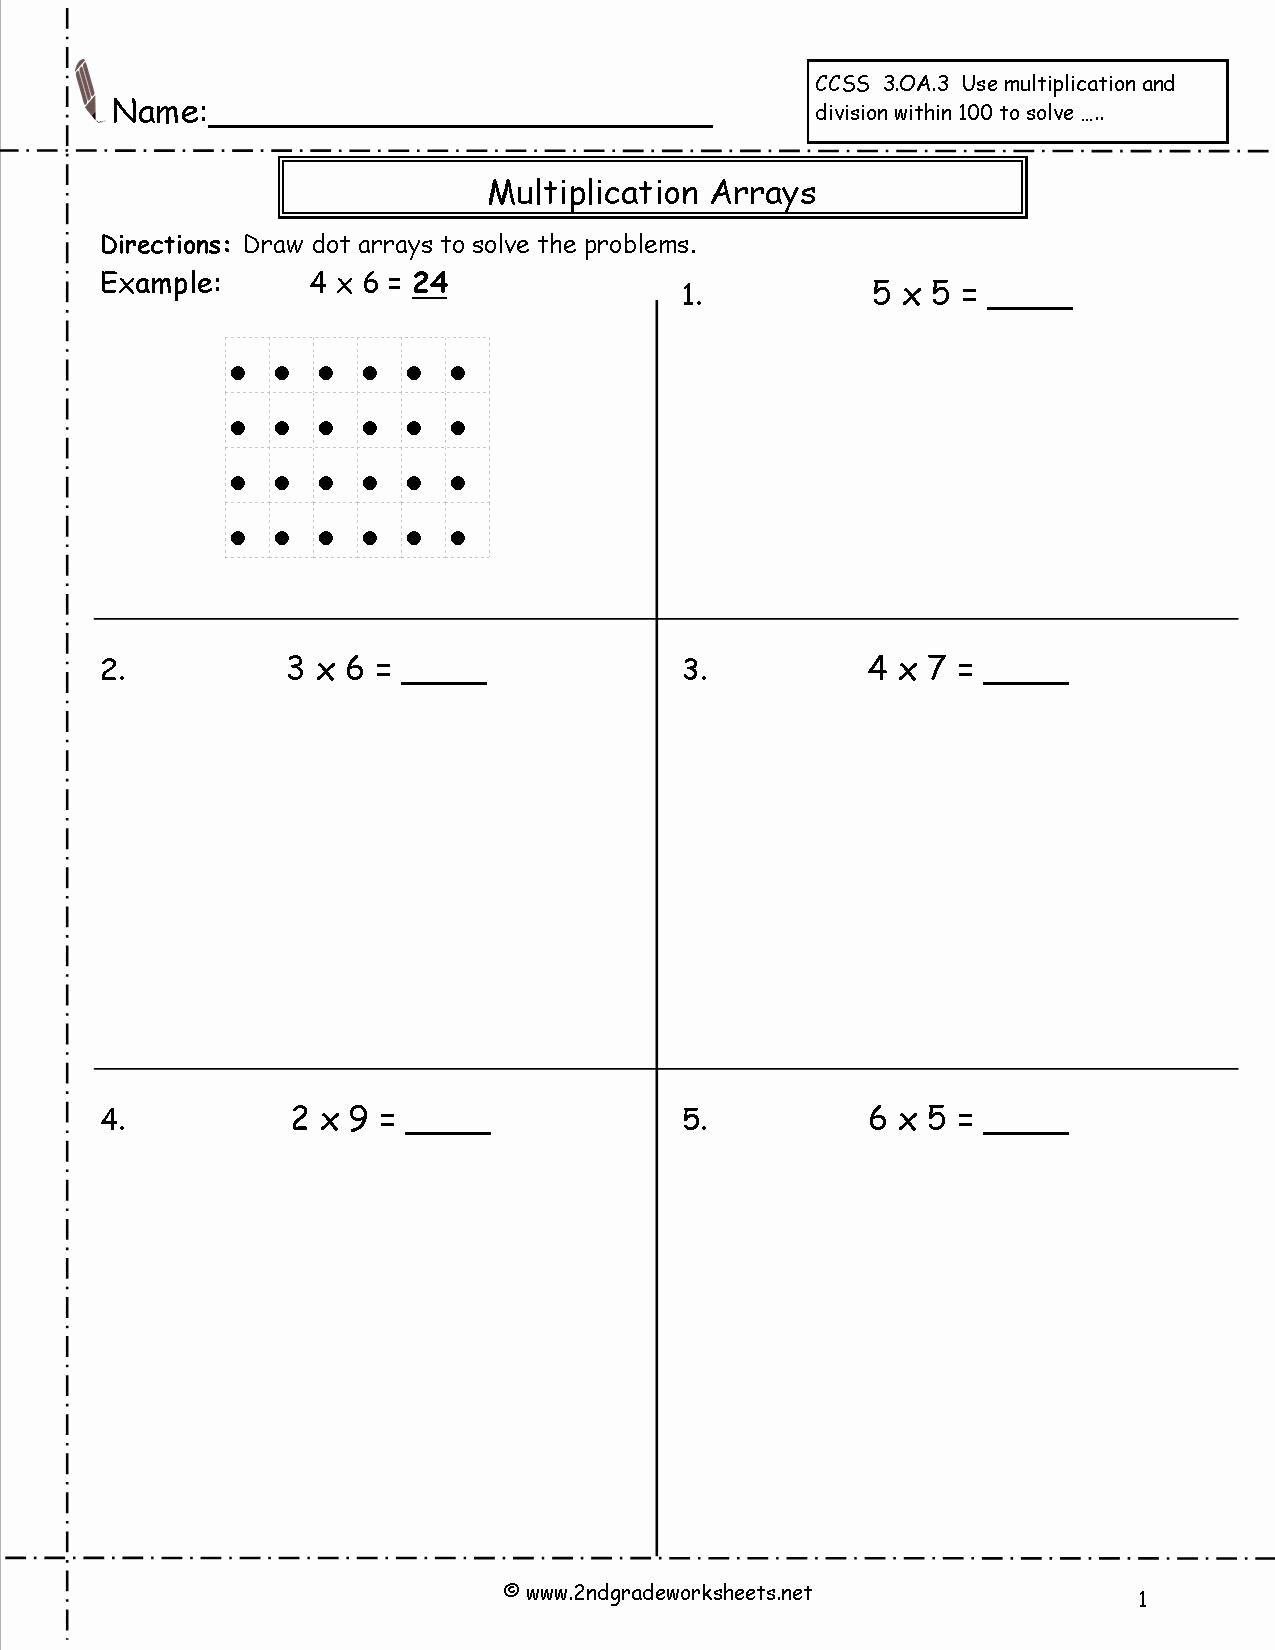 Array Worksheet 2nd Grade Lovely Array Worksheets to Print Array Worksheets  2nd Grade Free in 2020   Array worksheets [ 1650 x 1275 Pixel ]